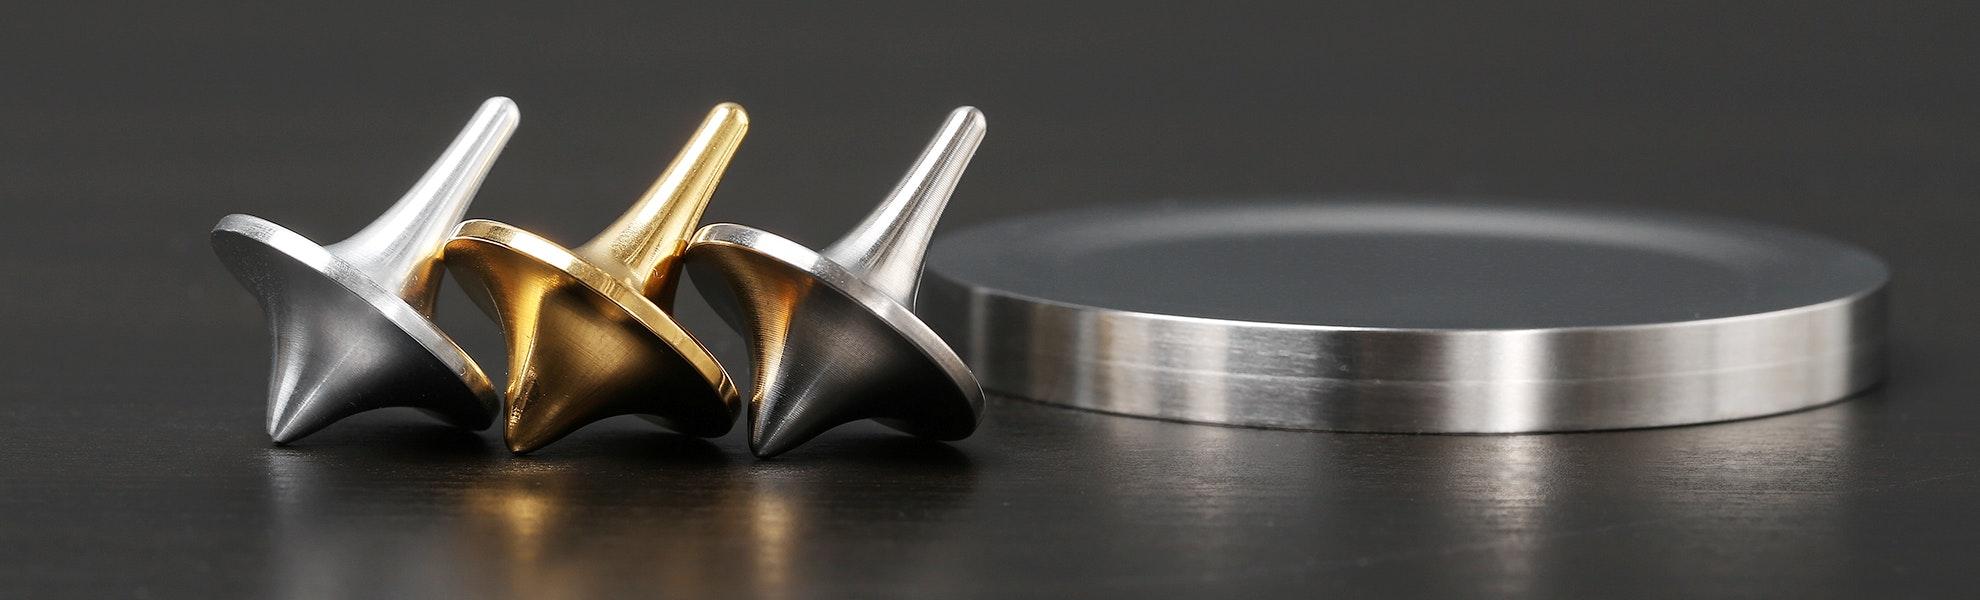 ForeverSpin 3-Top Bundle